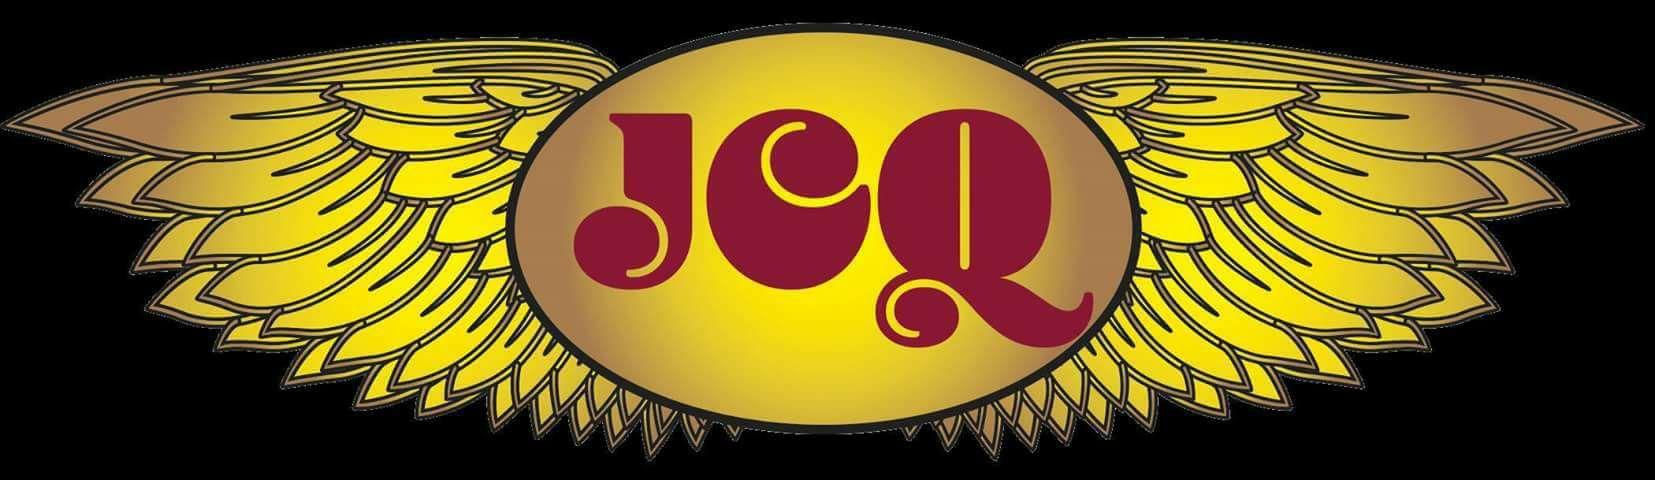 2018 JCQ logo.jpg